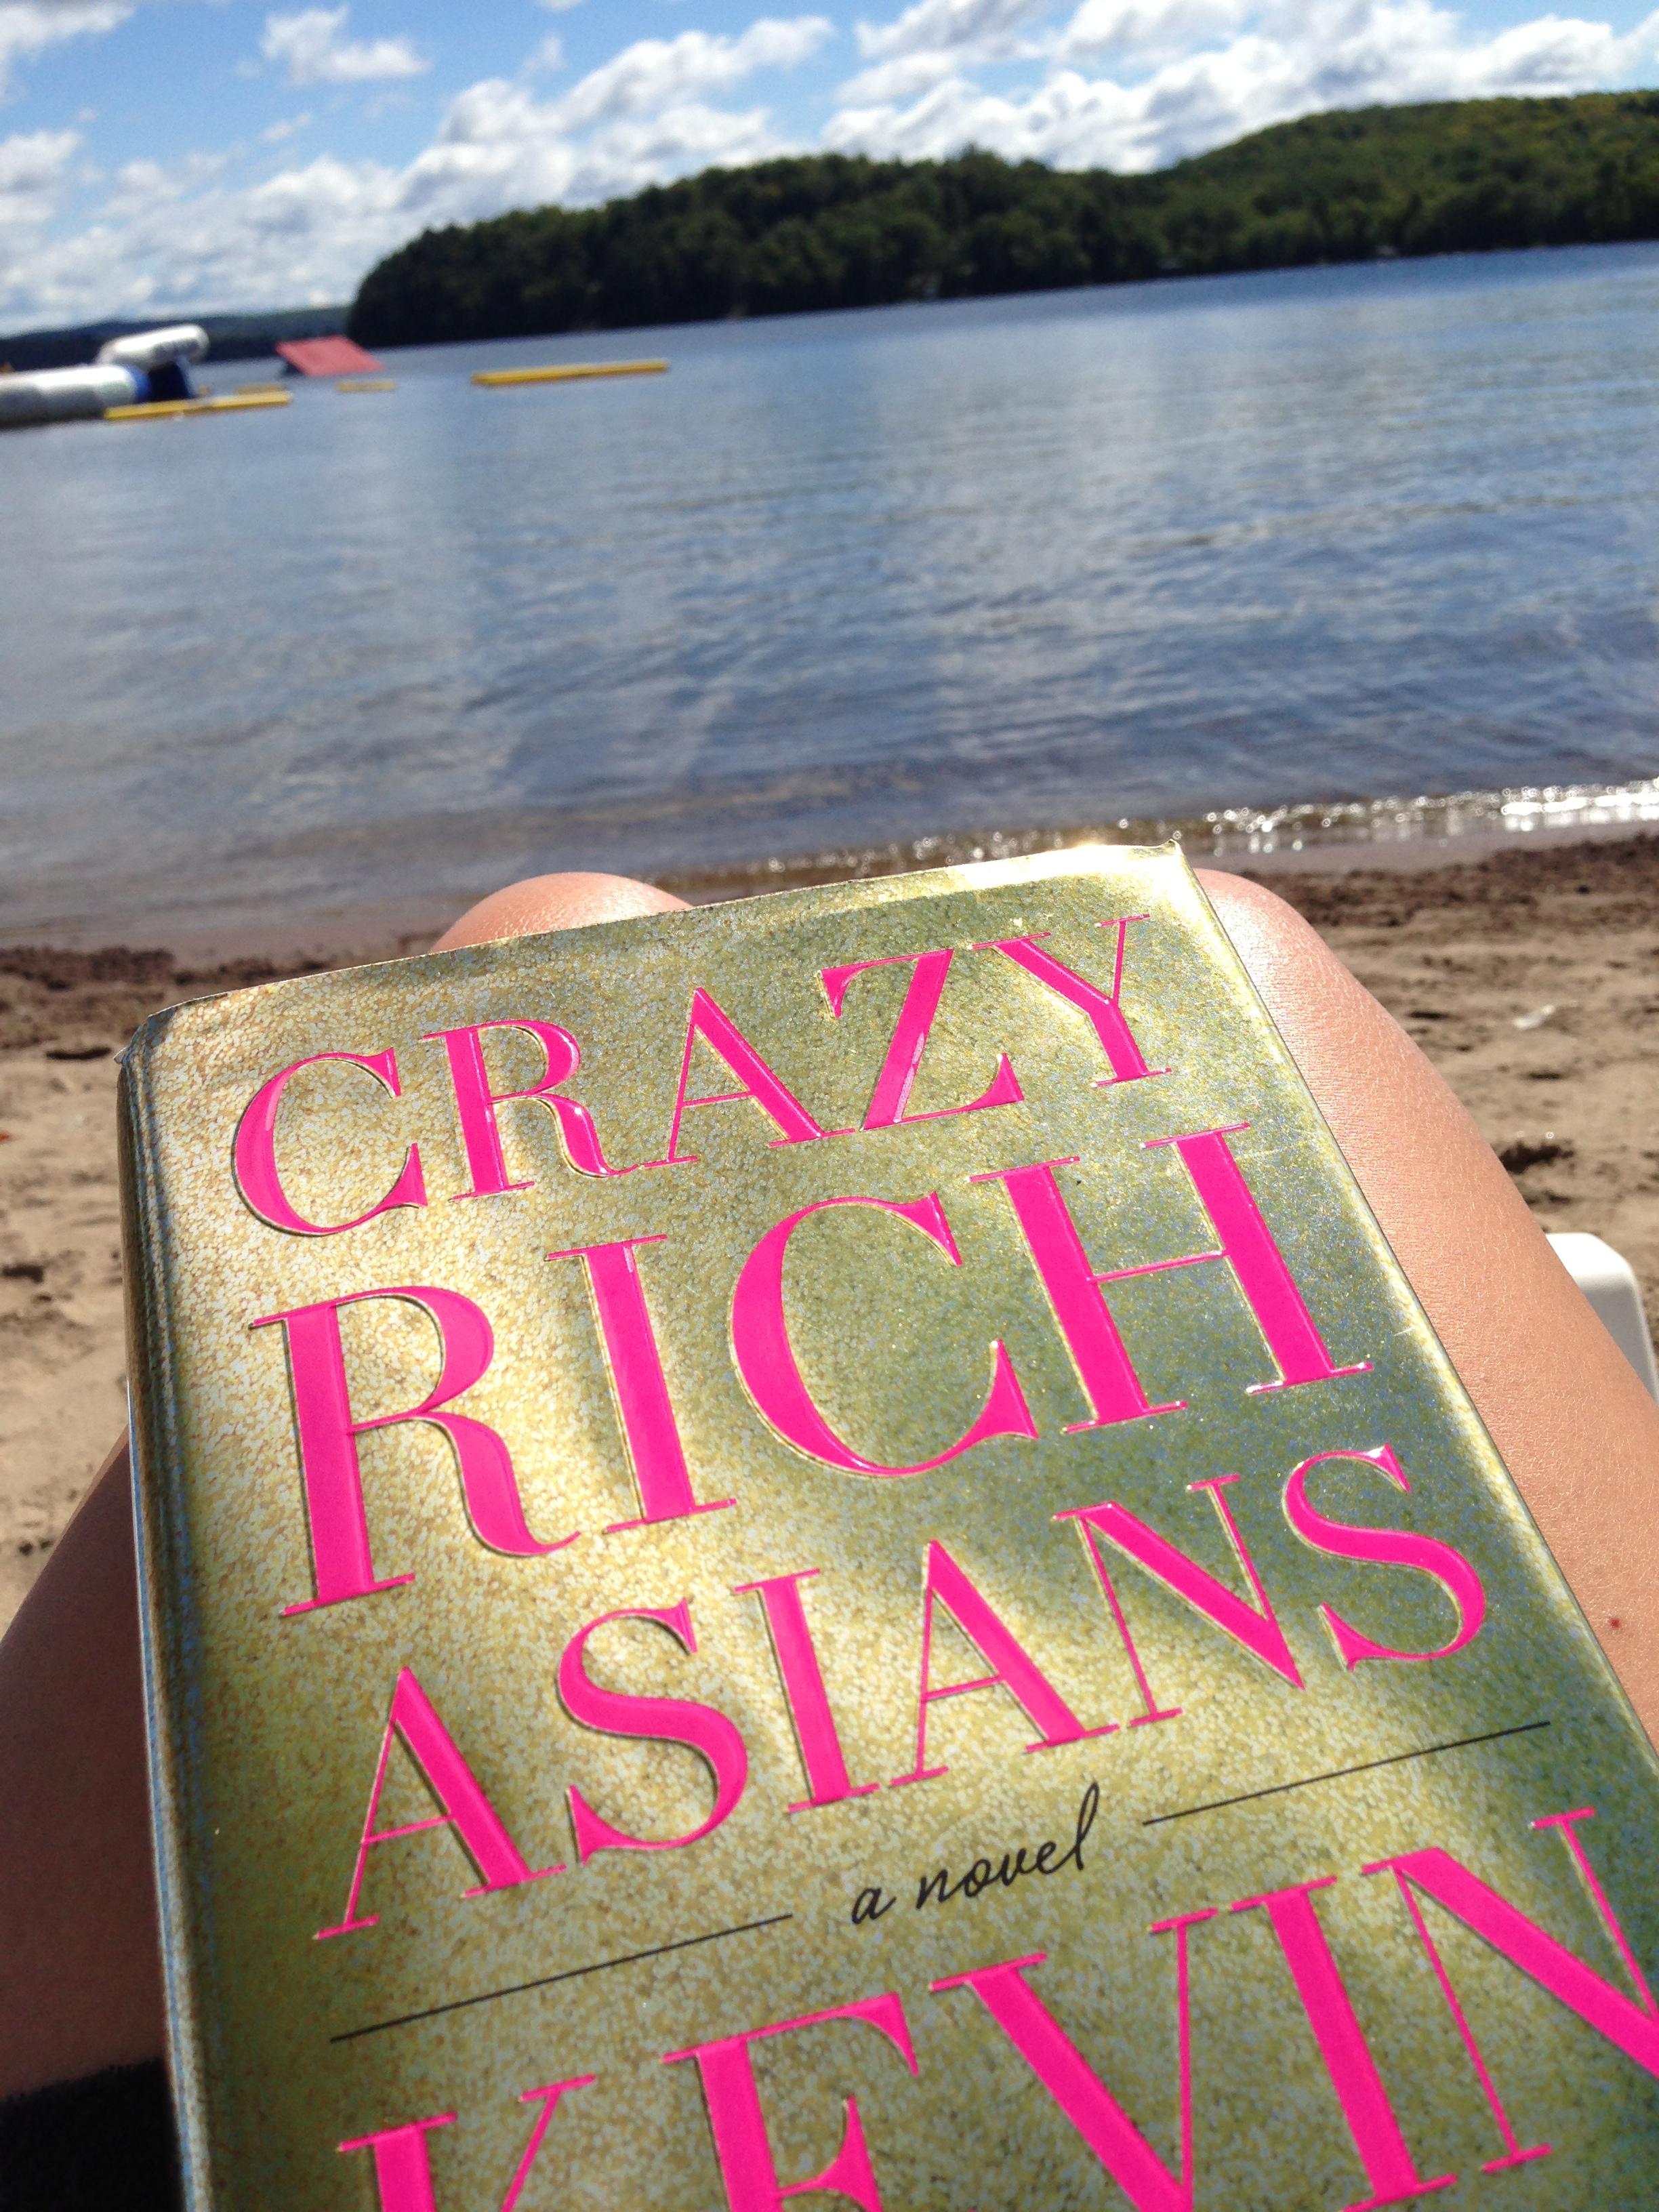 Living Vicariously through Crazy Rich Asians